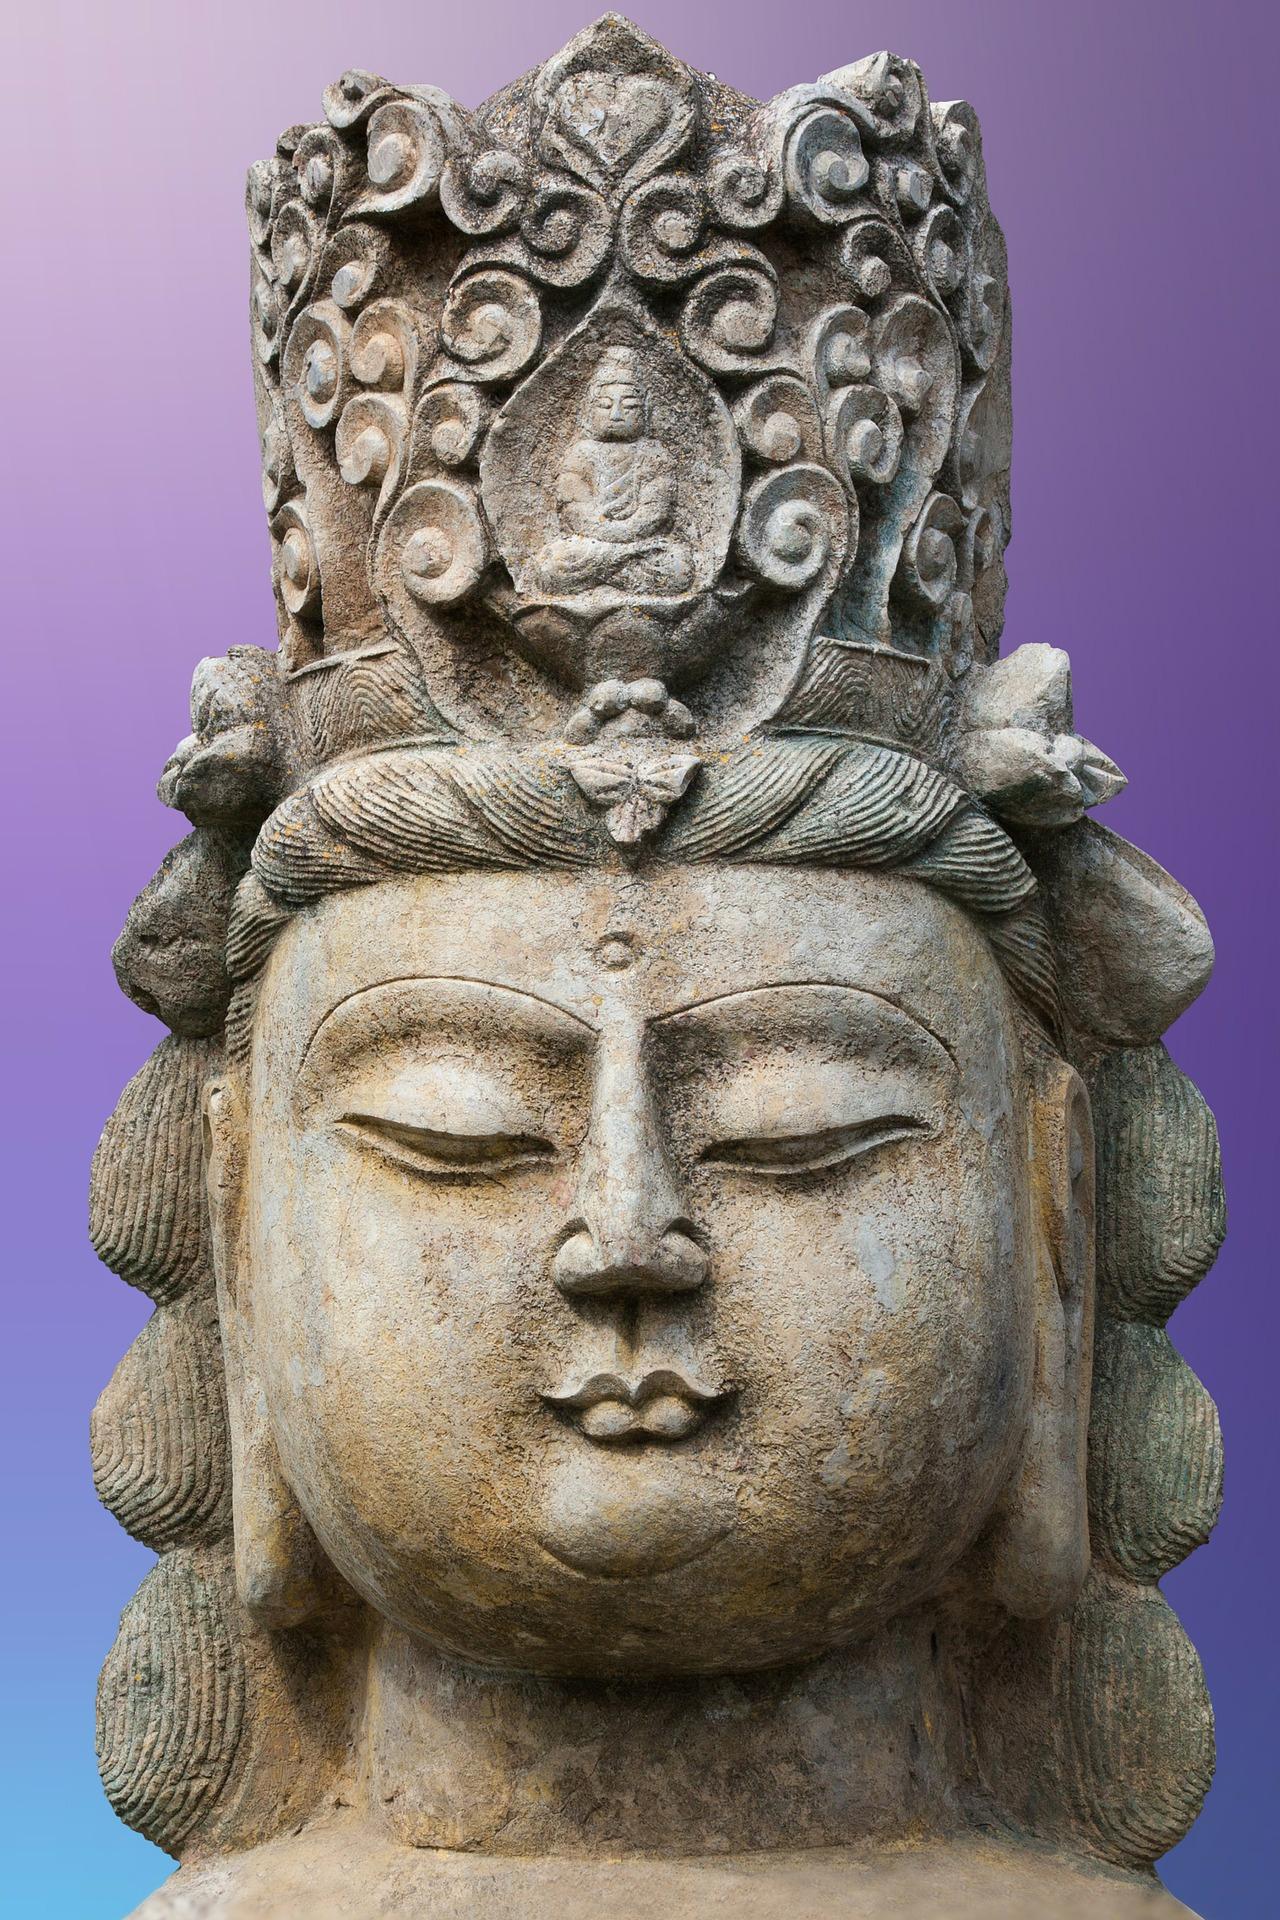 blocked crown chakra